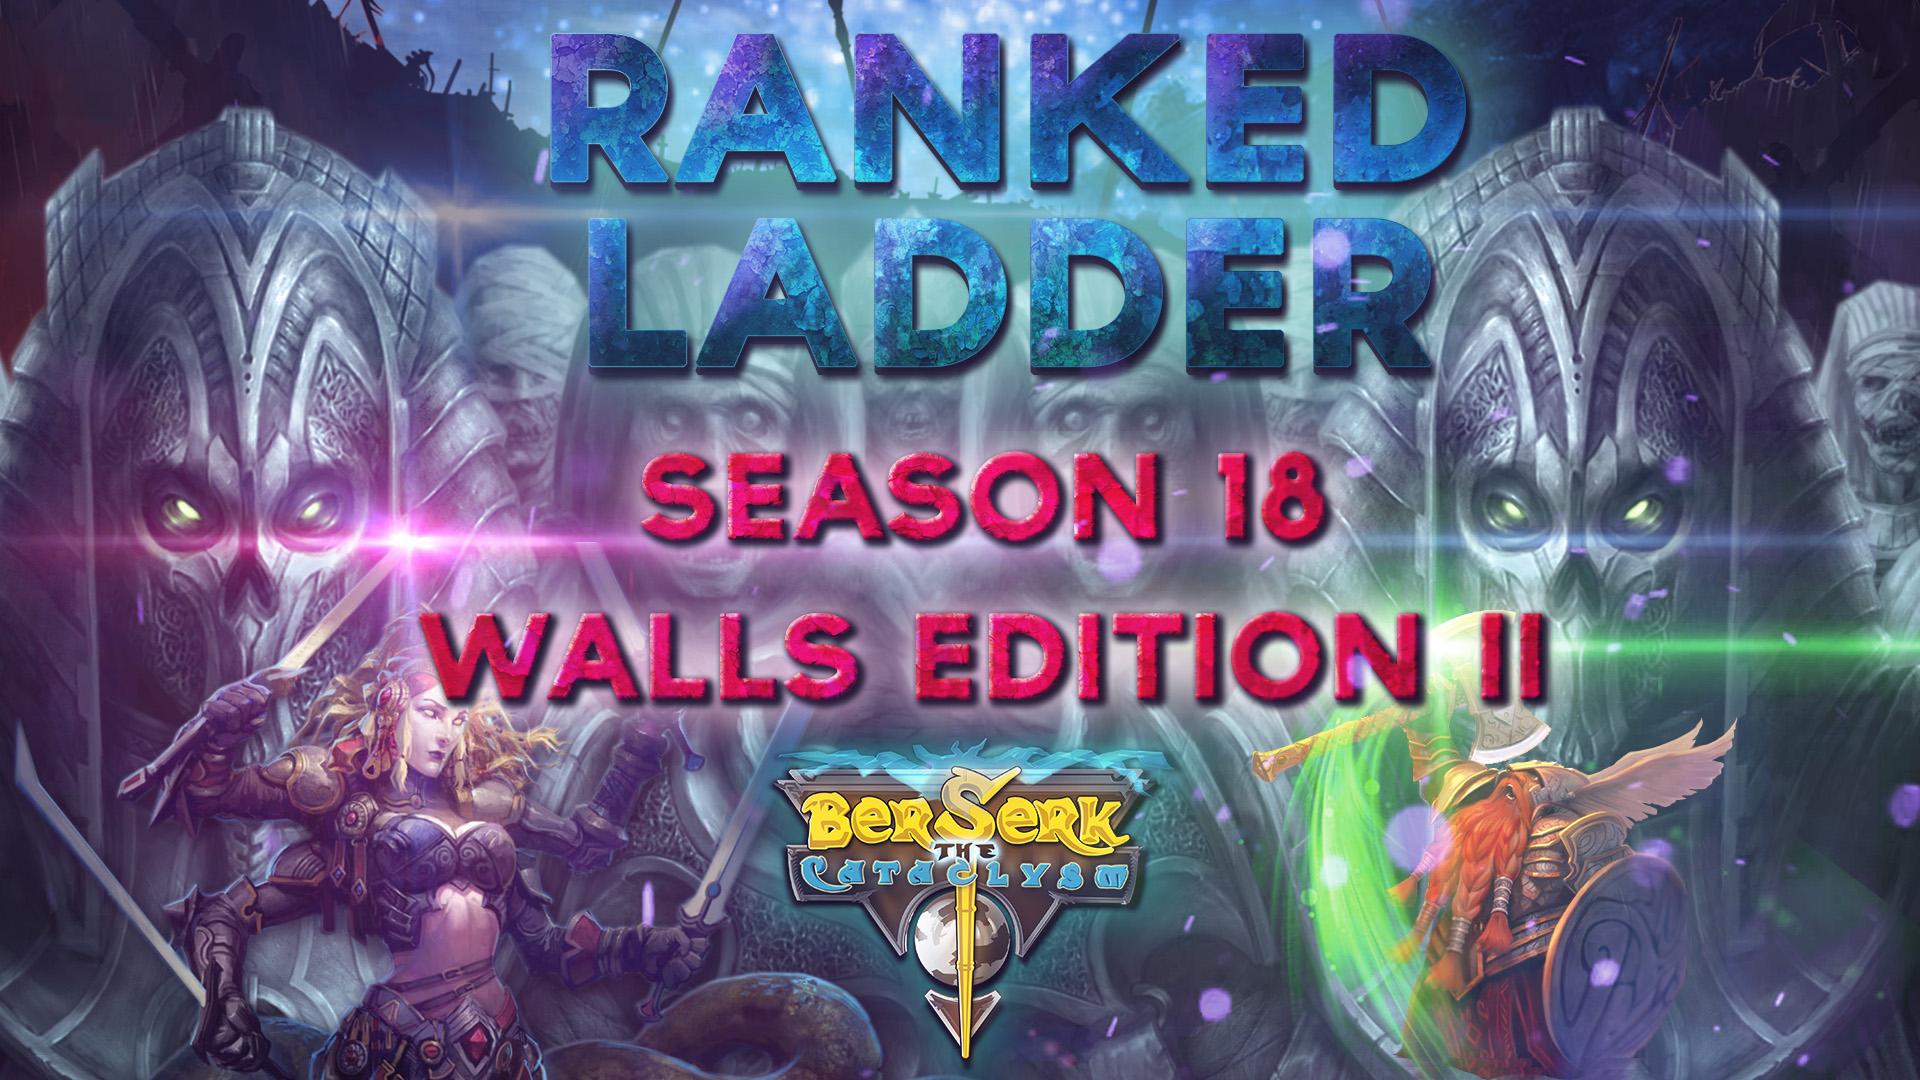 Ranked_LAdder_Season_18.jpg